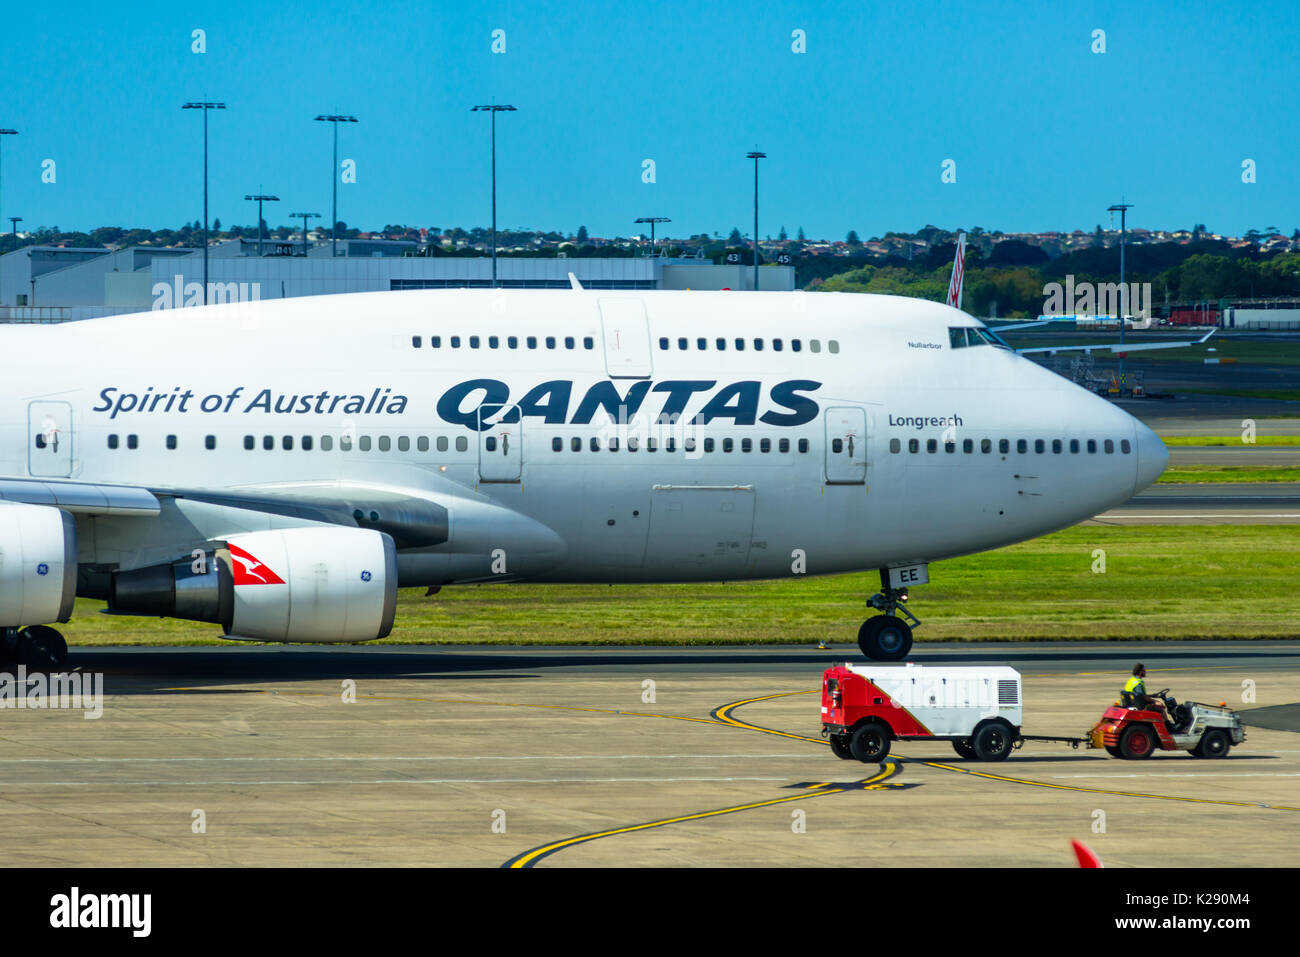 A Qantas 747 jumbo jet next to a baggage vehicle at Sydney international airport, New South Wales, Australia. - Stock Image